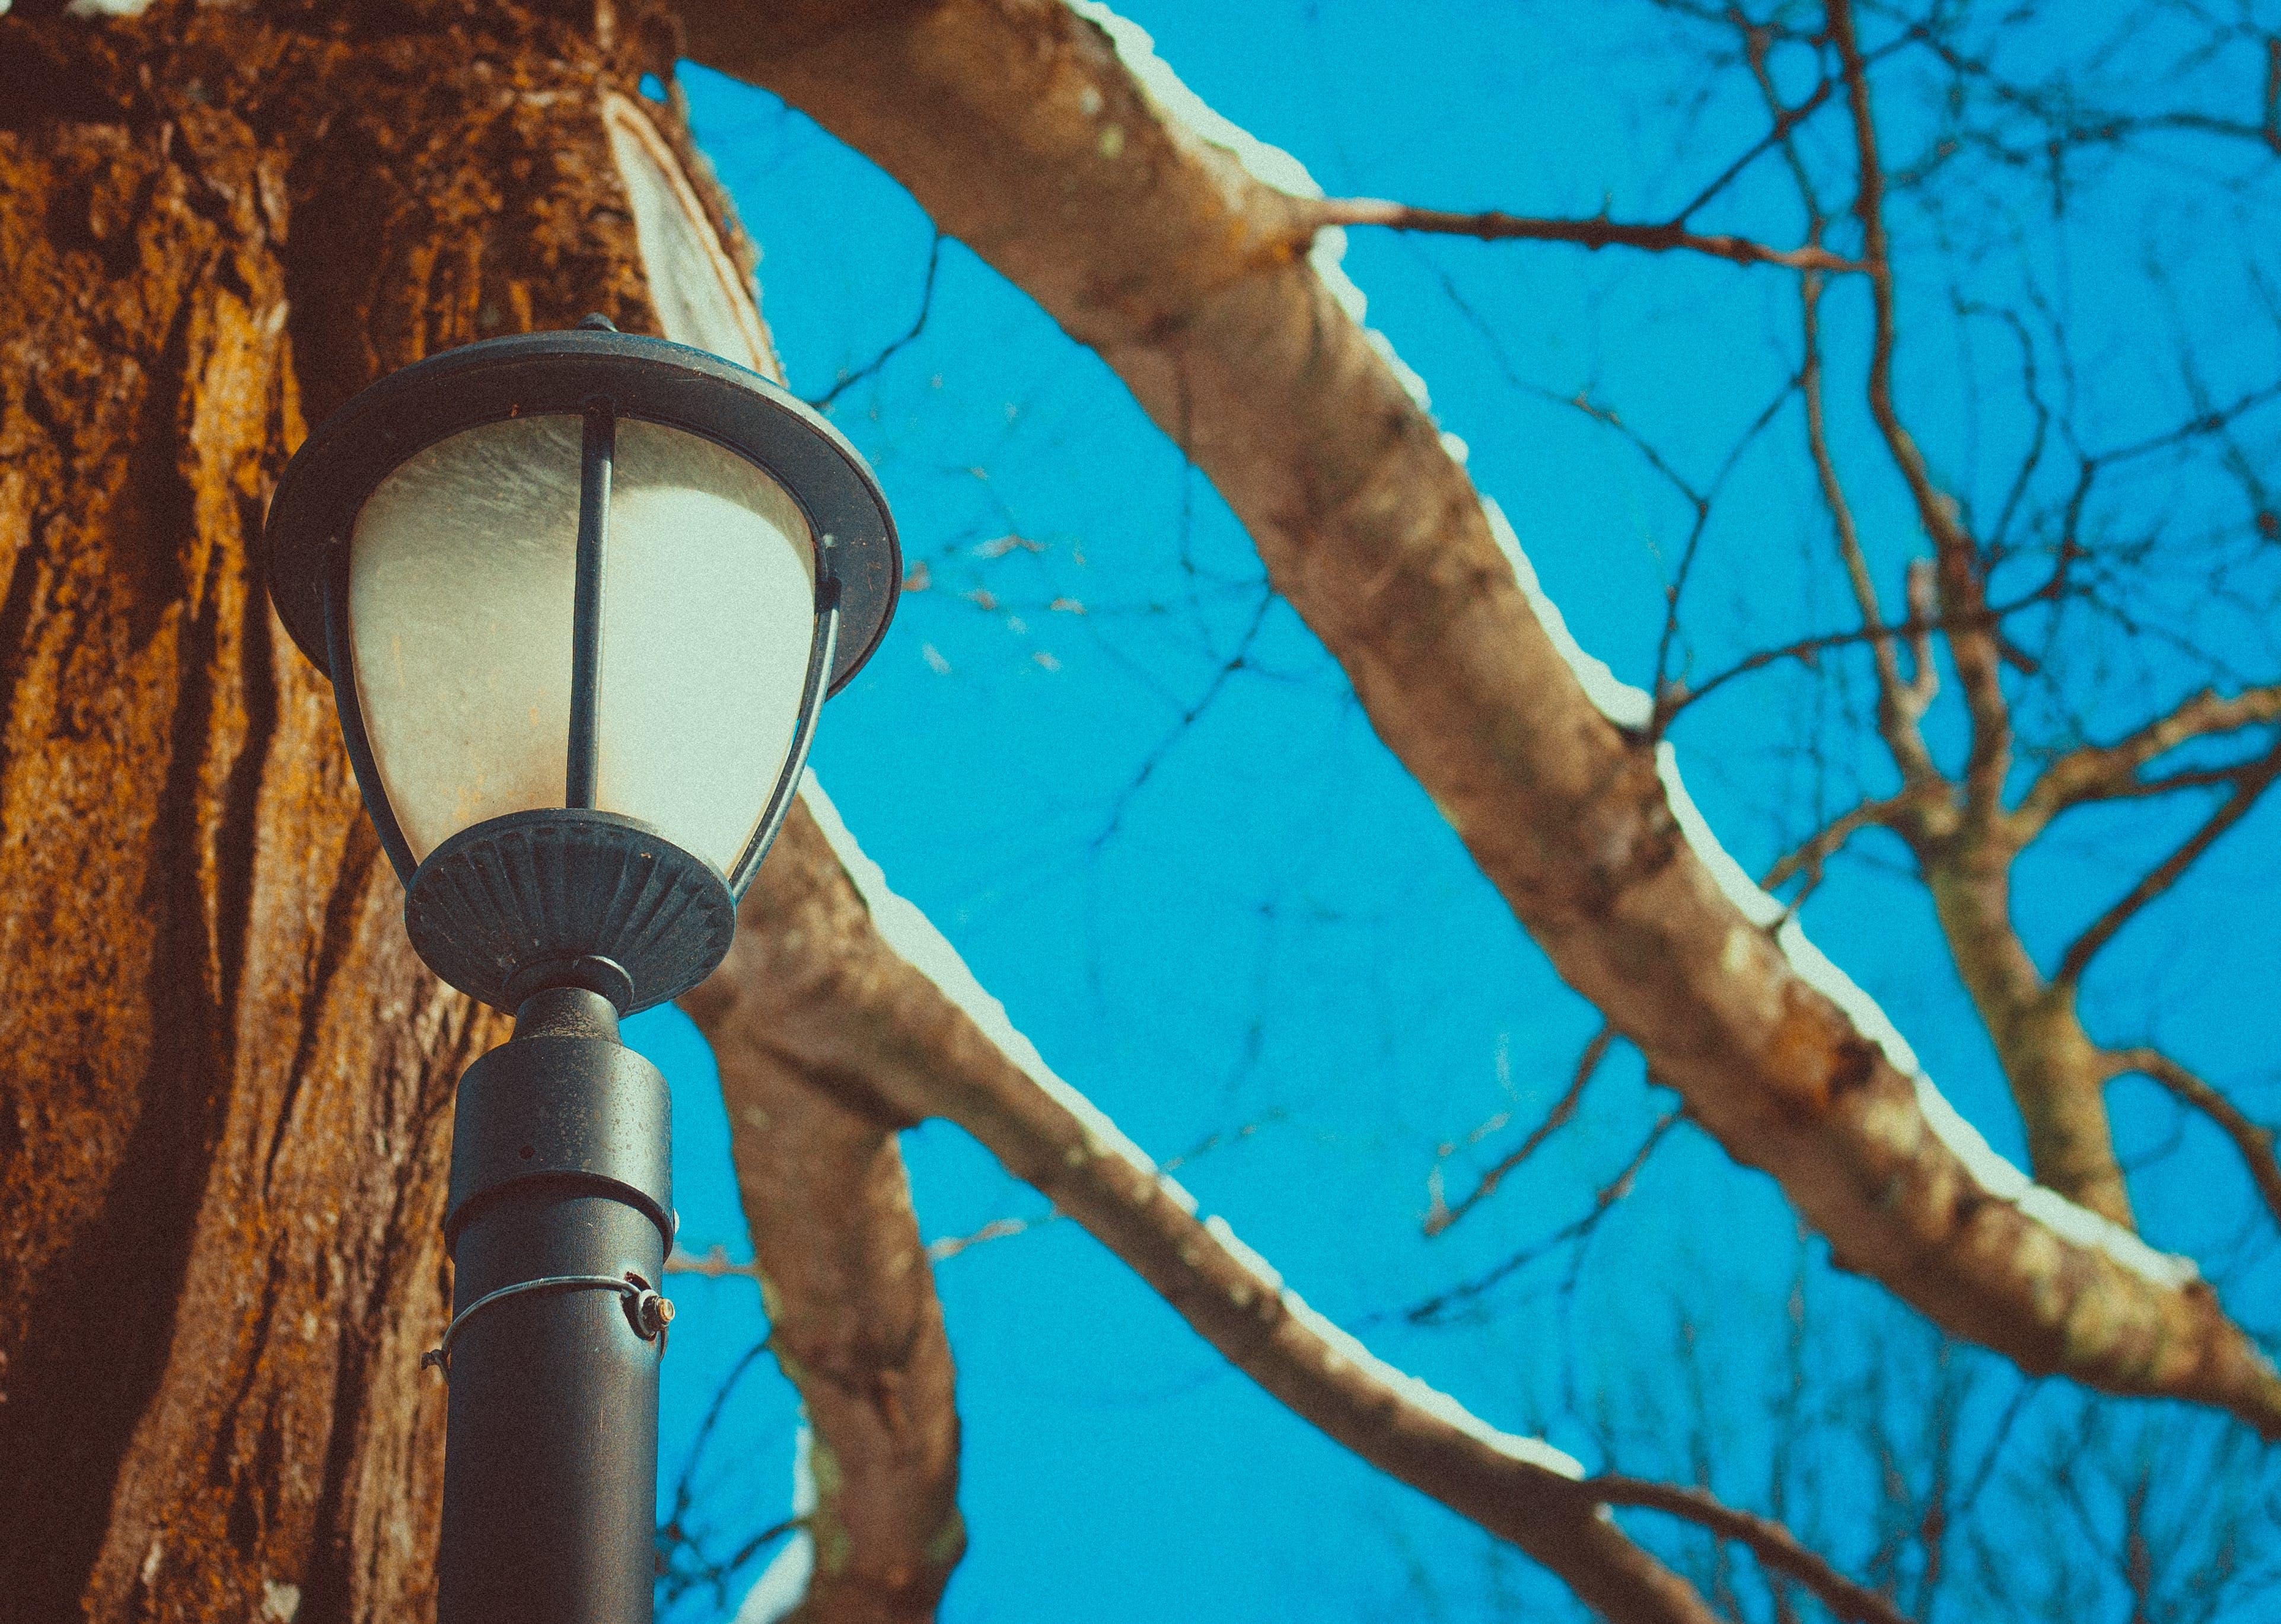 Black Post Lamp Near Tree